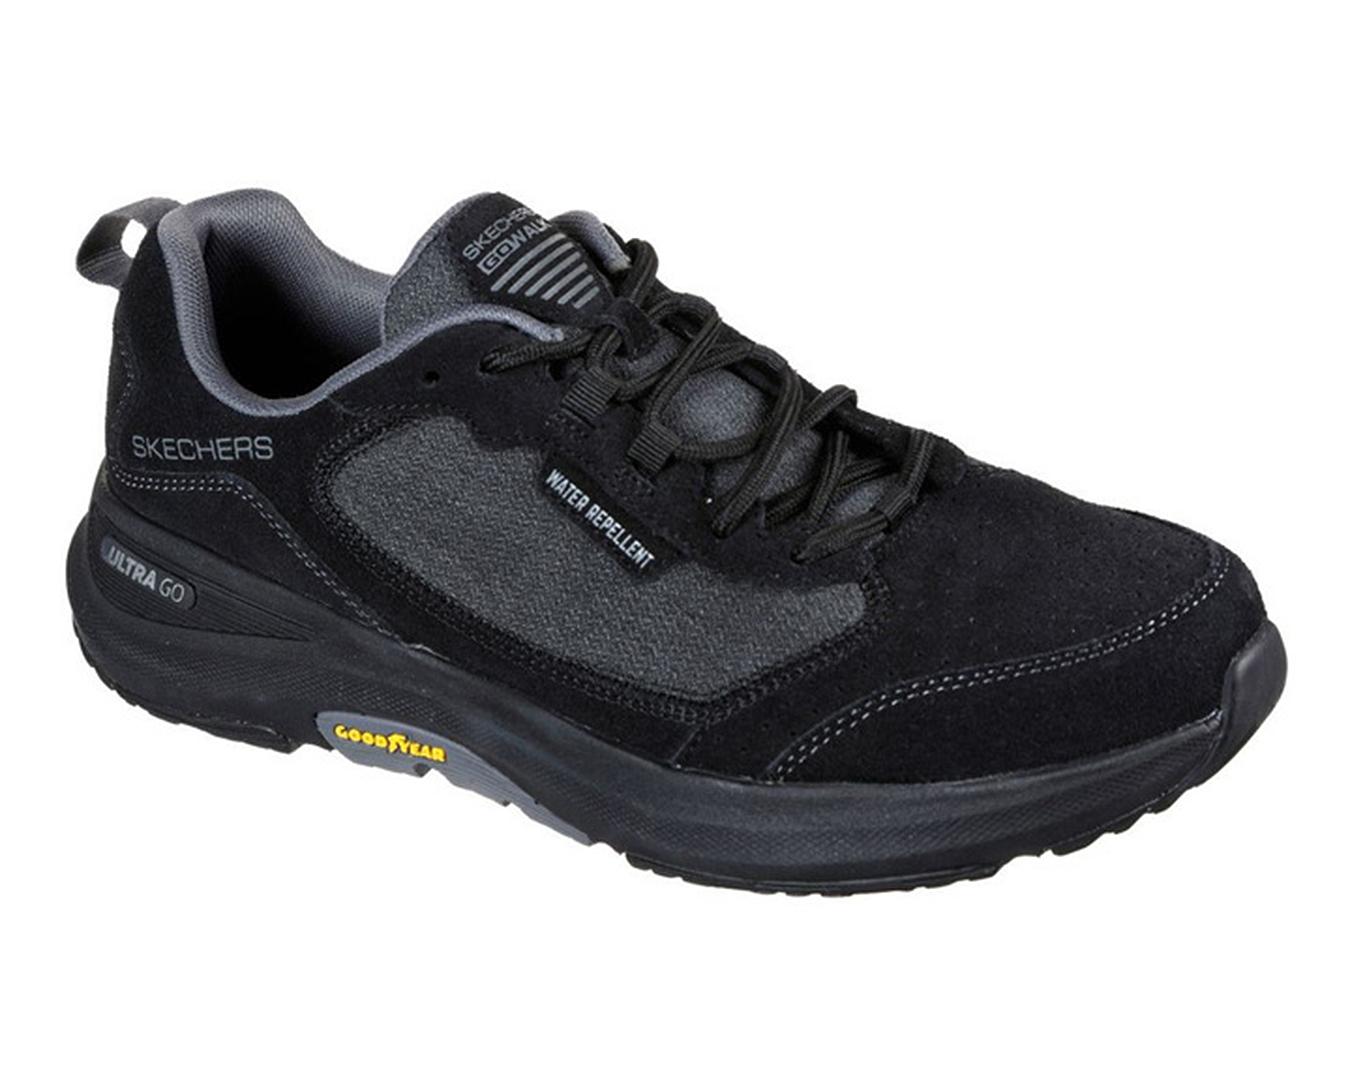 Skechers Go Walk Outdoors - Minsi Shoe